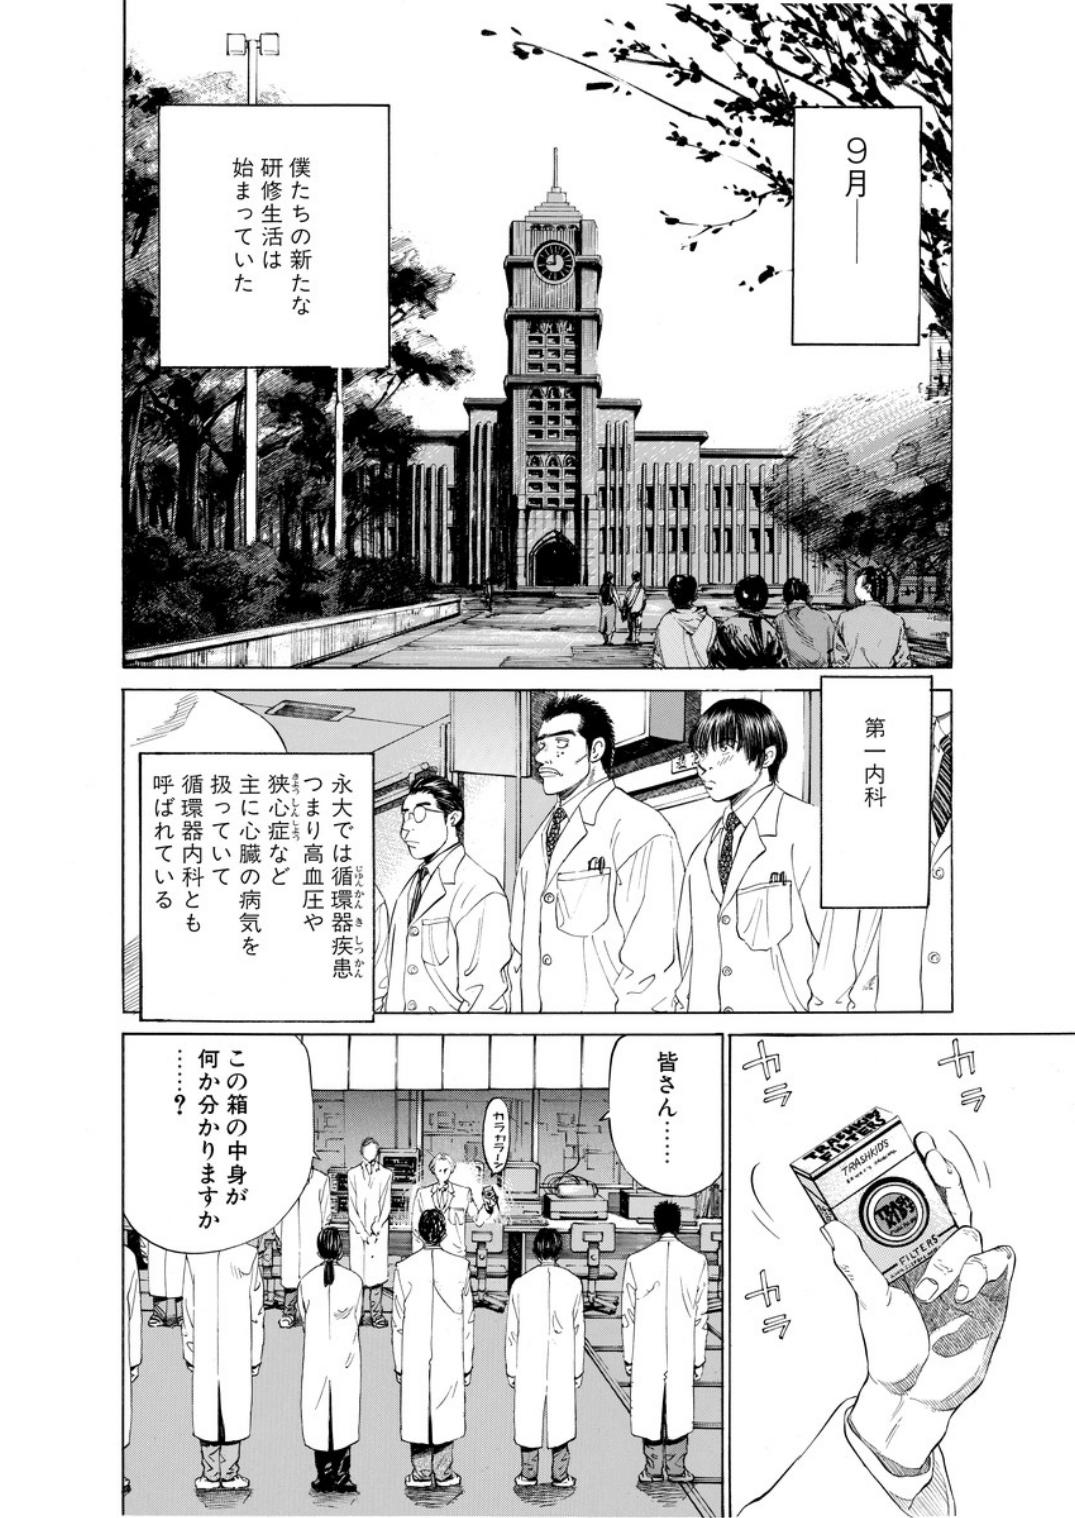 001bj_page-0162.jpg